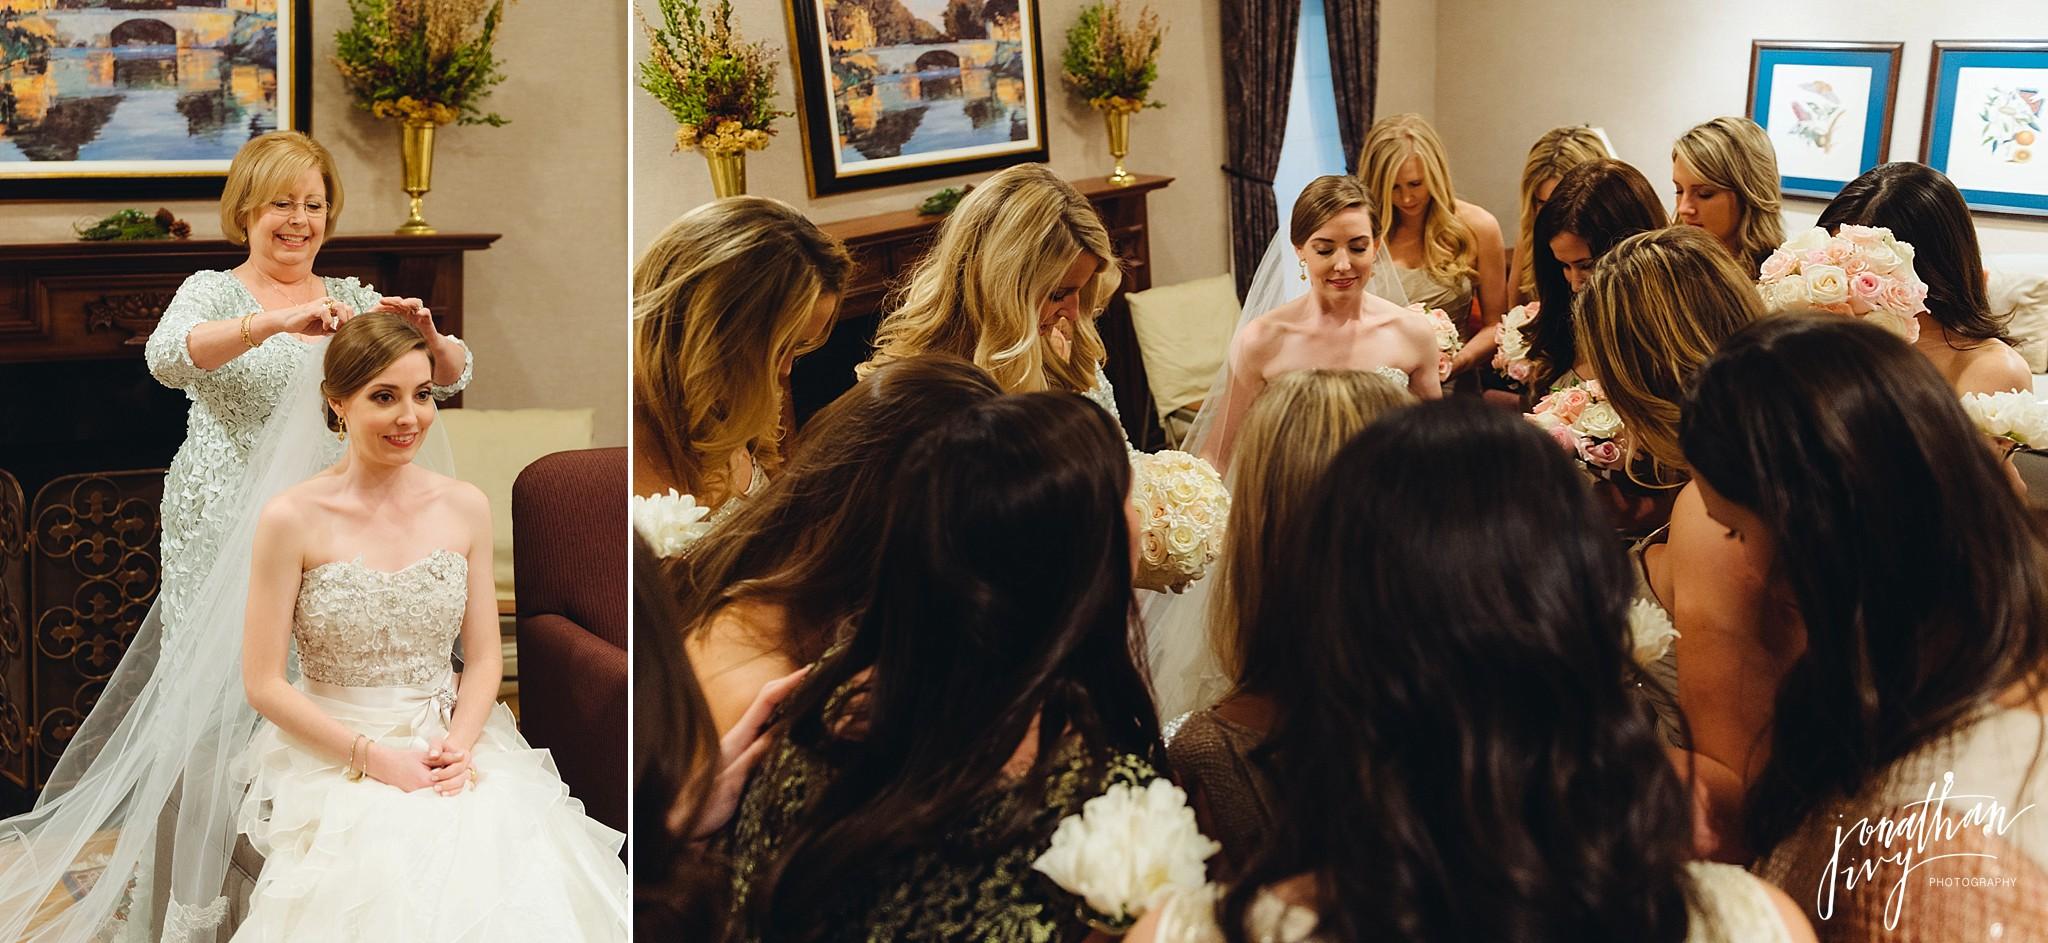 Houston Country Club Wedding